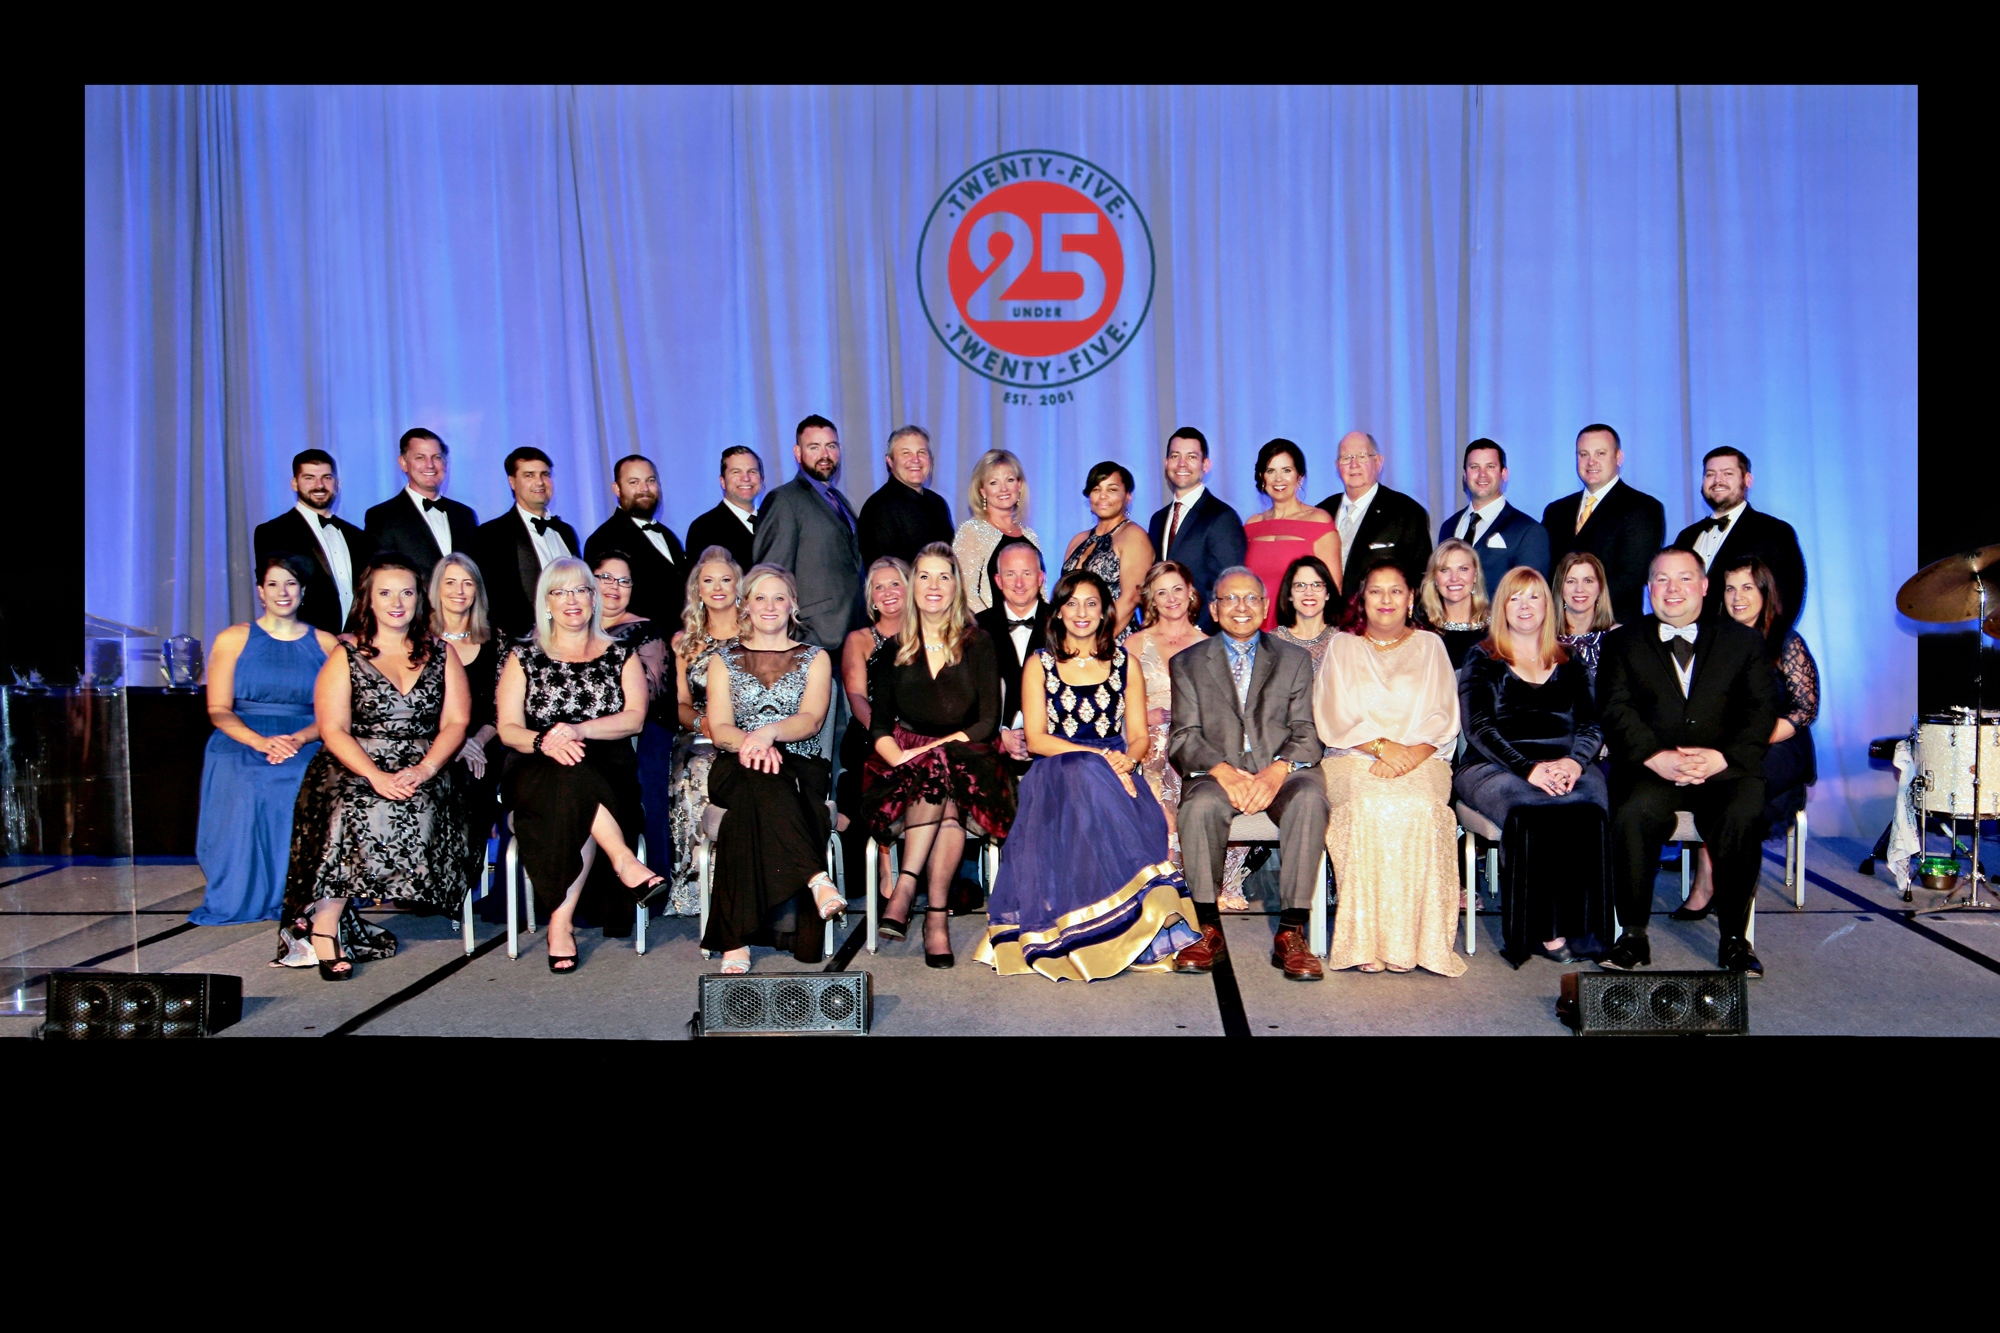 #TBT: 25 Under 25 Award photos, videos online